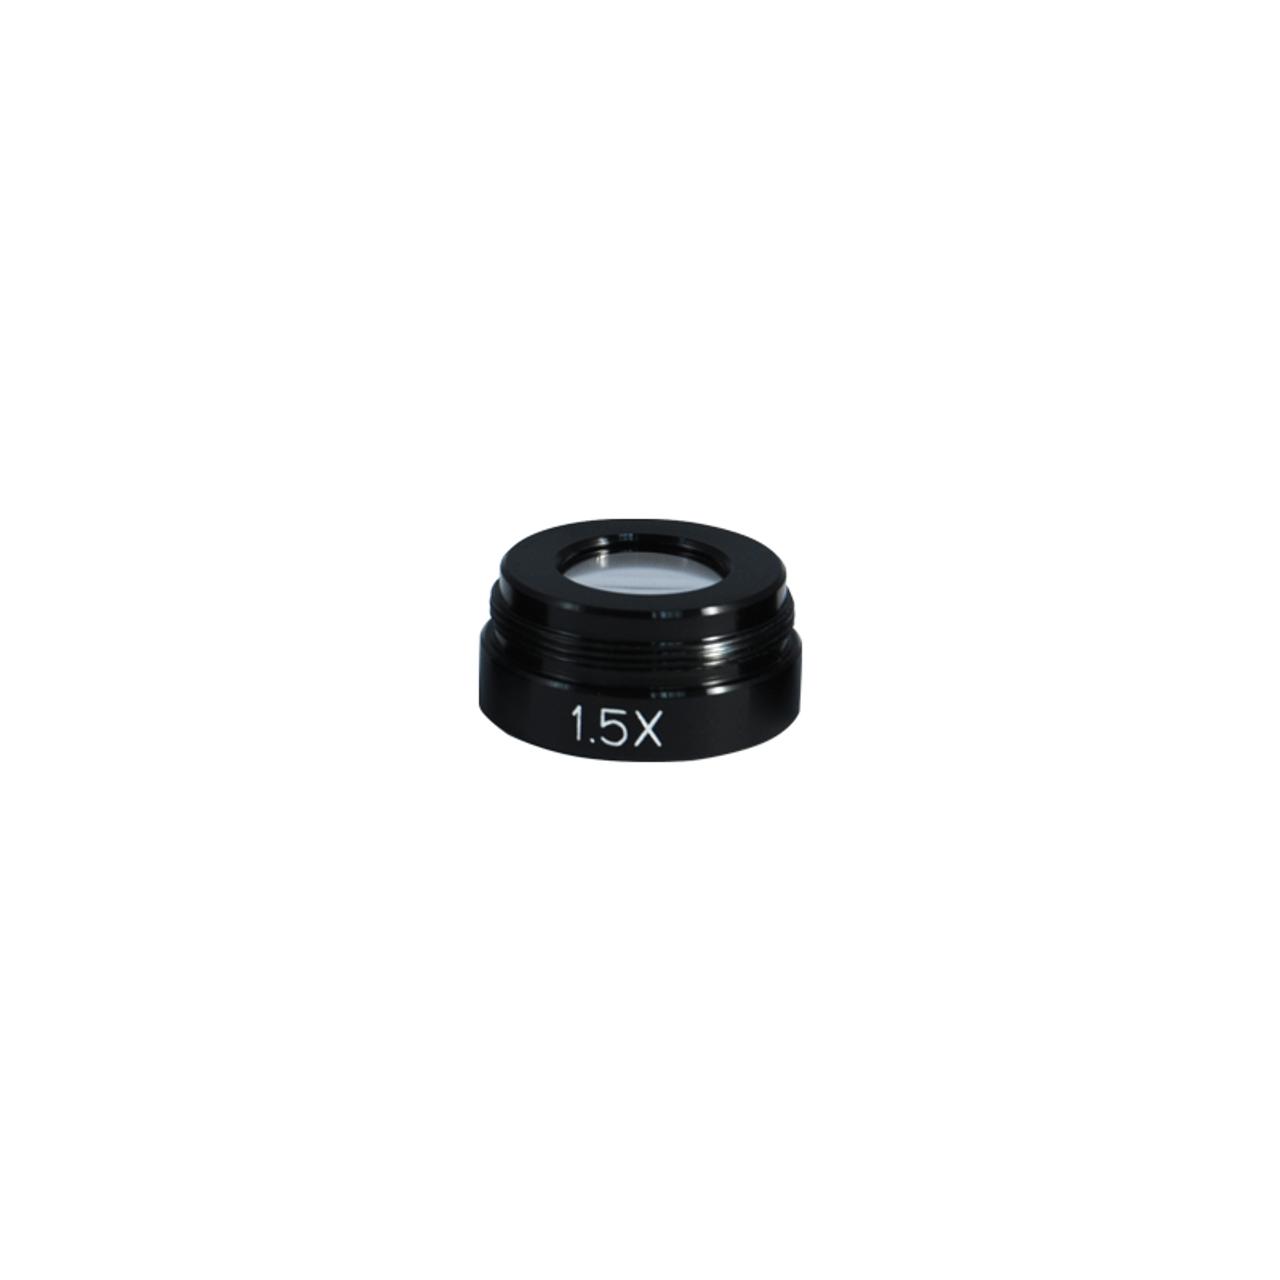 25mm MZ07014511 BoliOptics 1.5X Auxiliary Objective Barlow Lens for MZ0701 Video Zoom Microscope